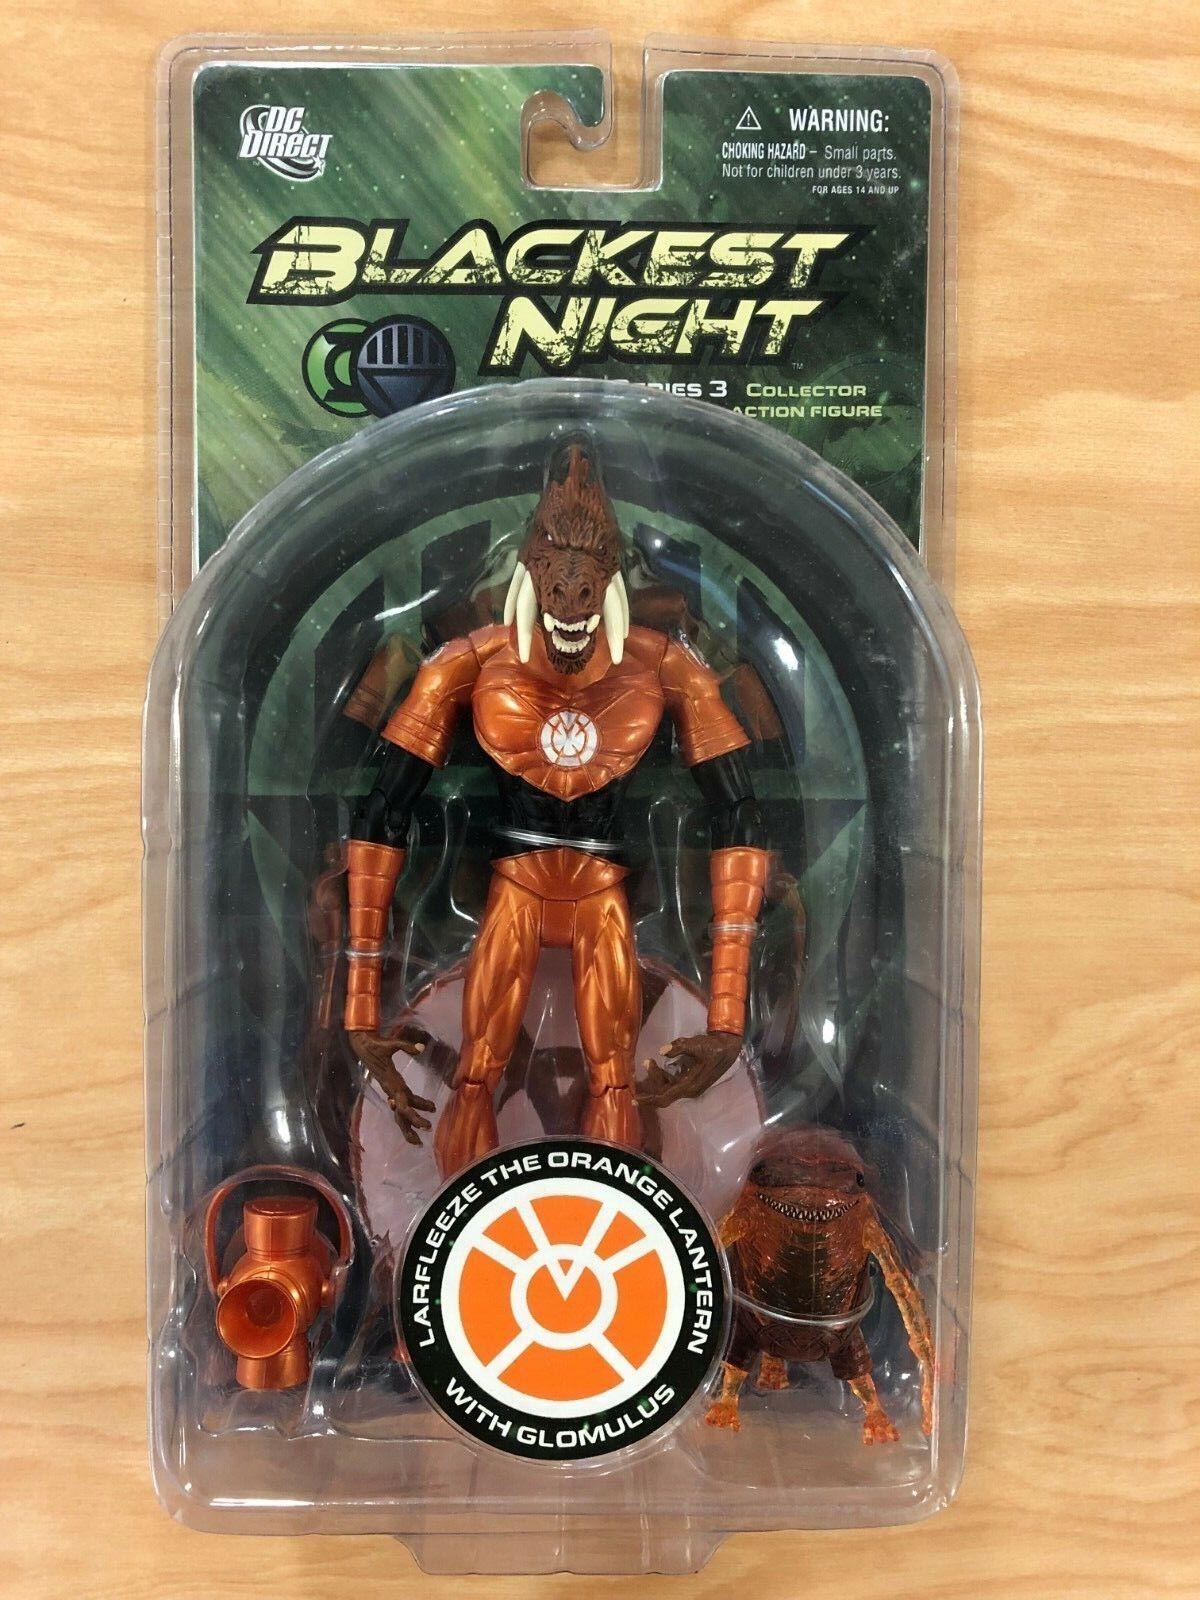 DC Direct negroest Night serie 3 Larfleeze la Naranja Linterna con glomulus Nuevo